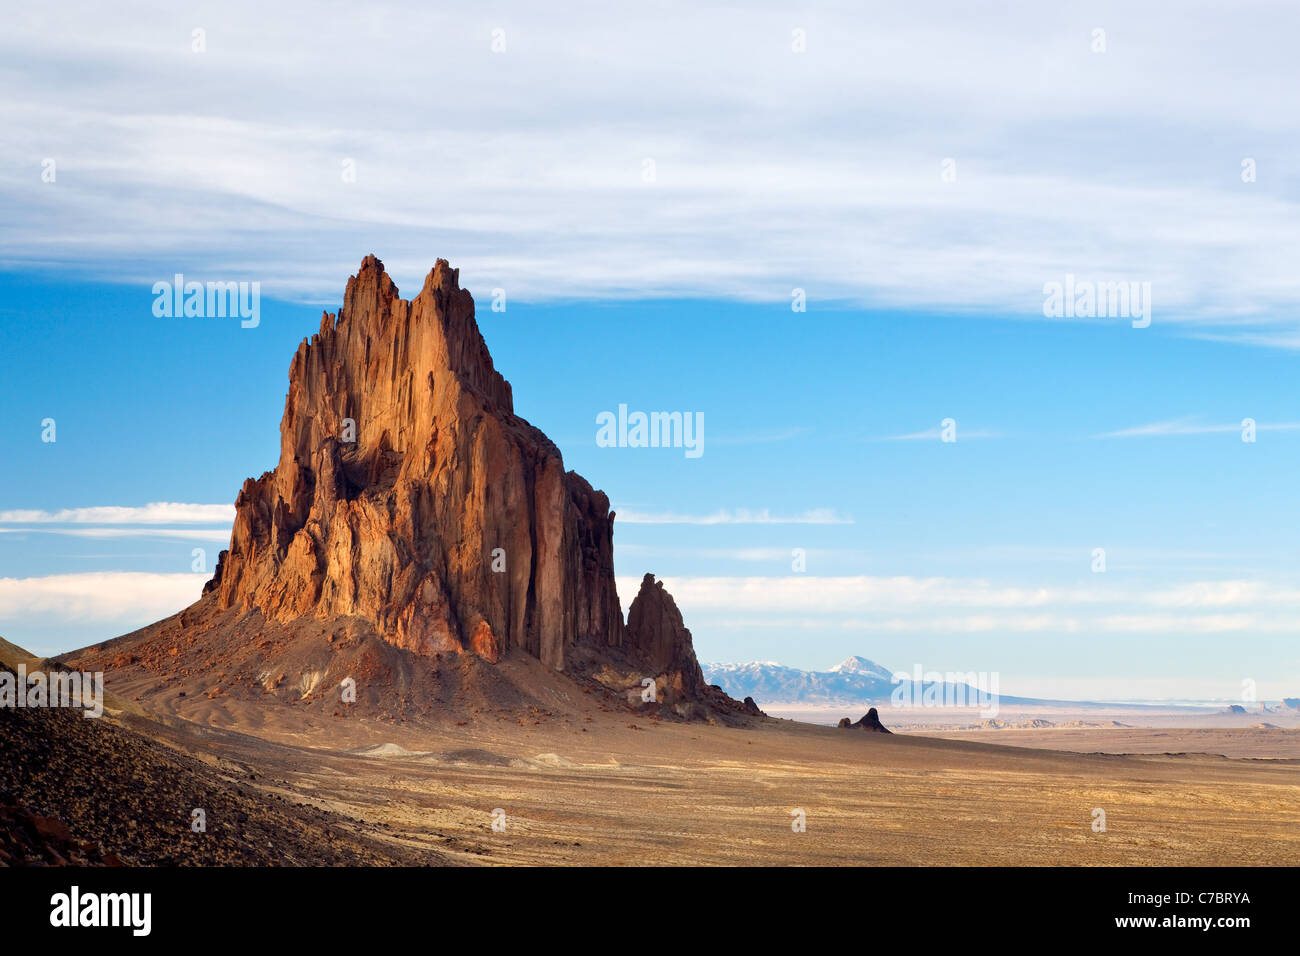 Shiprock Rock, New Mexico, USA Stock Photo